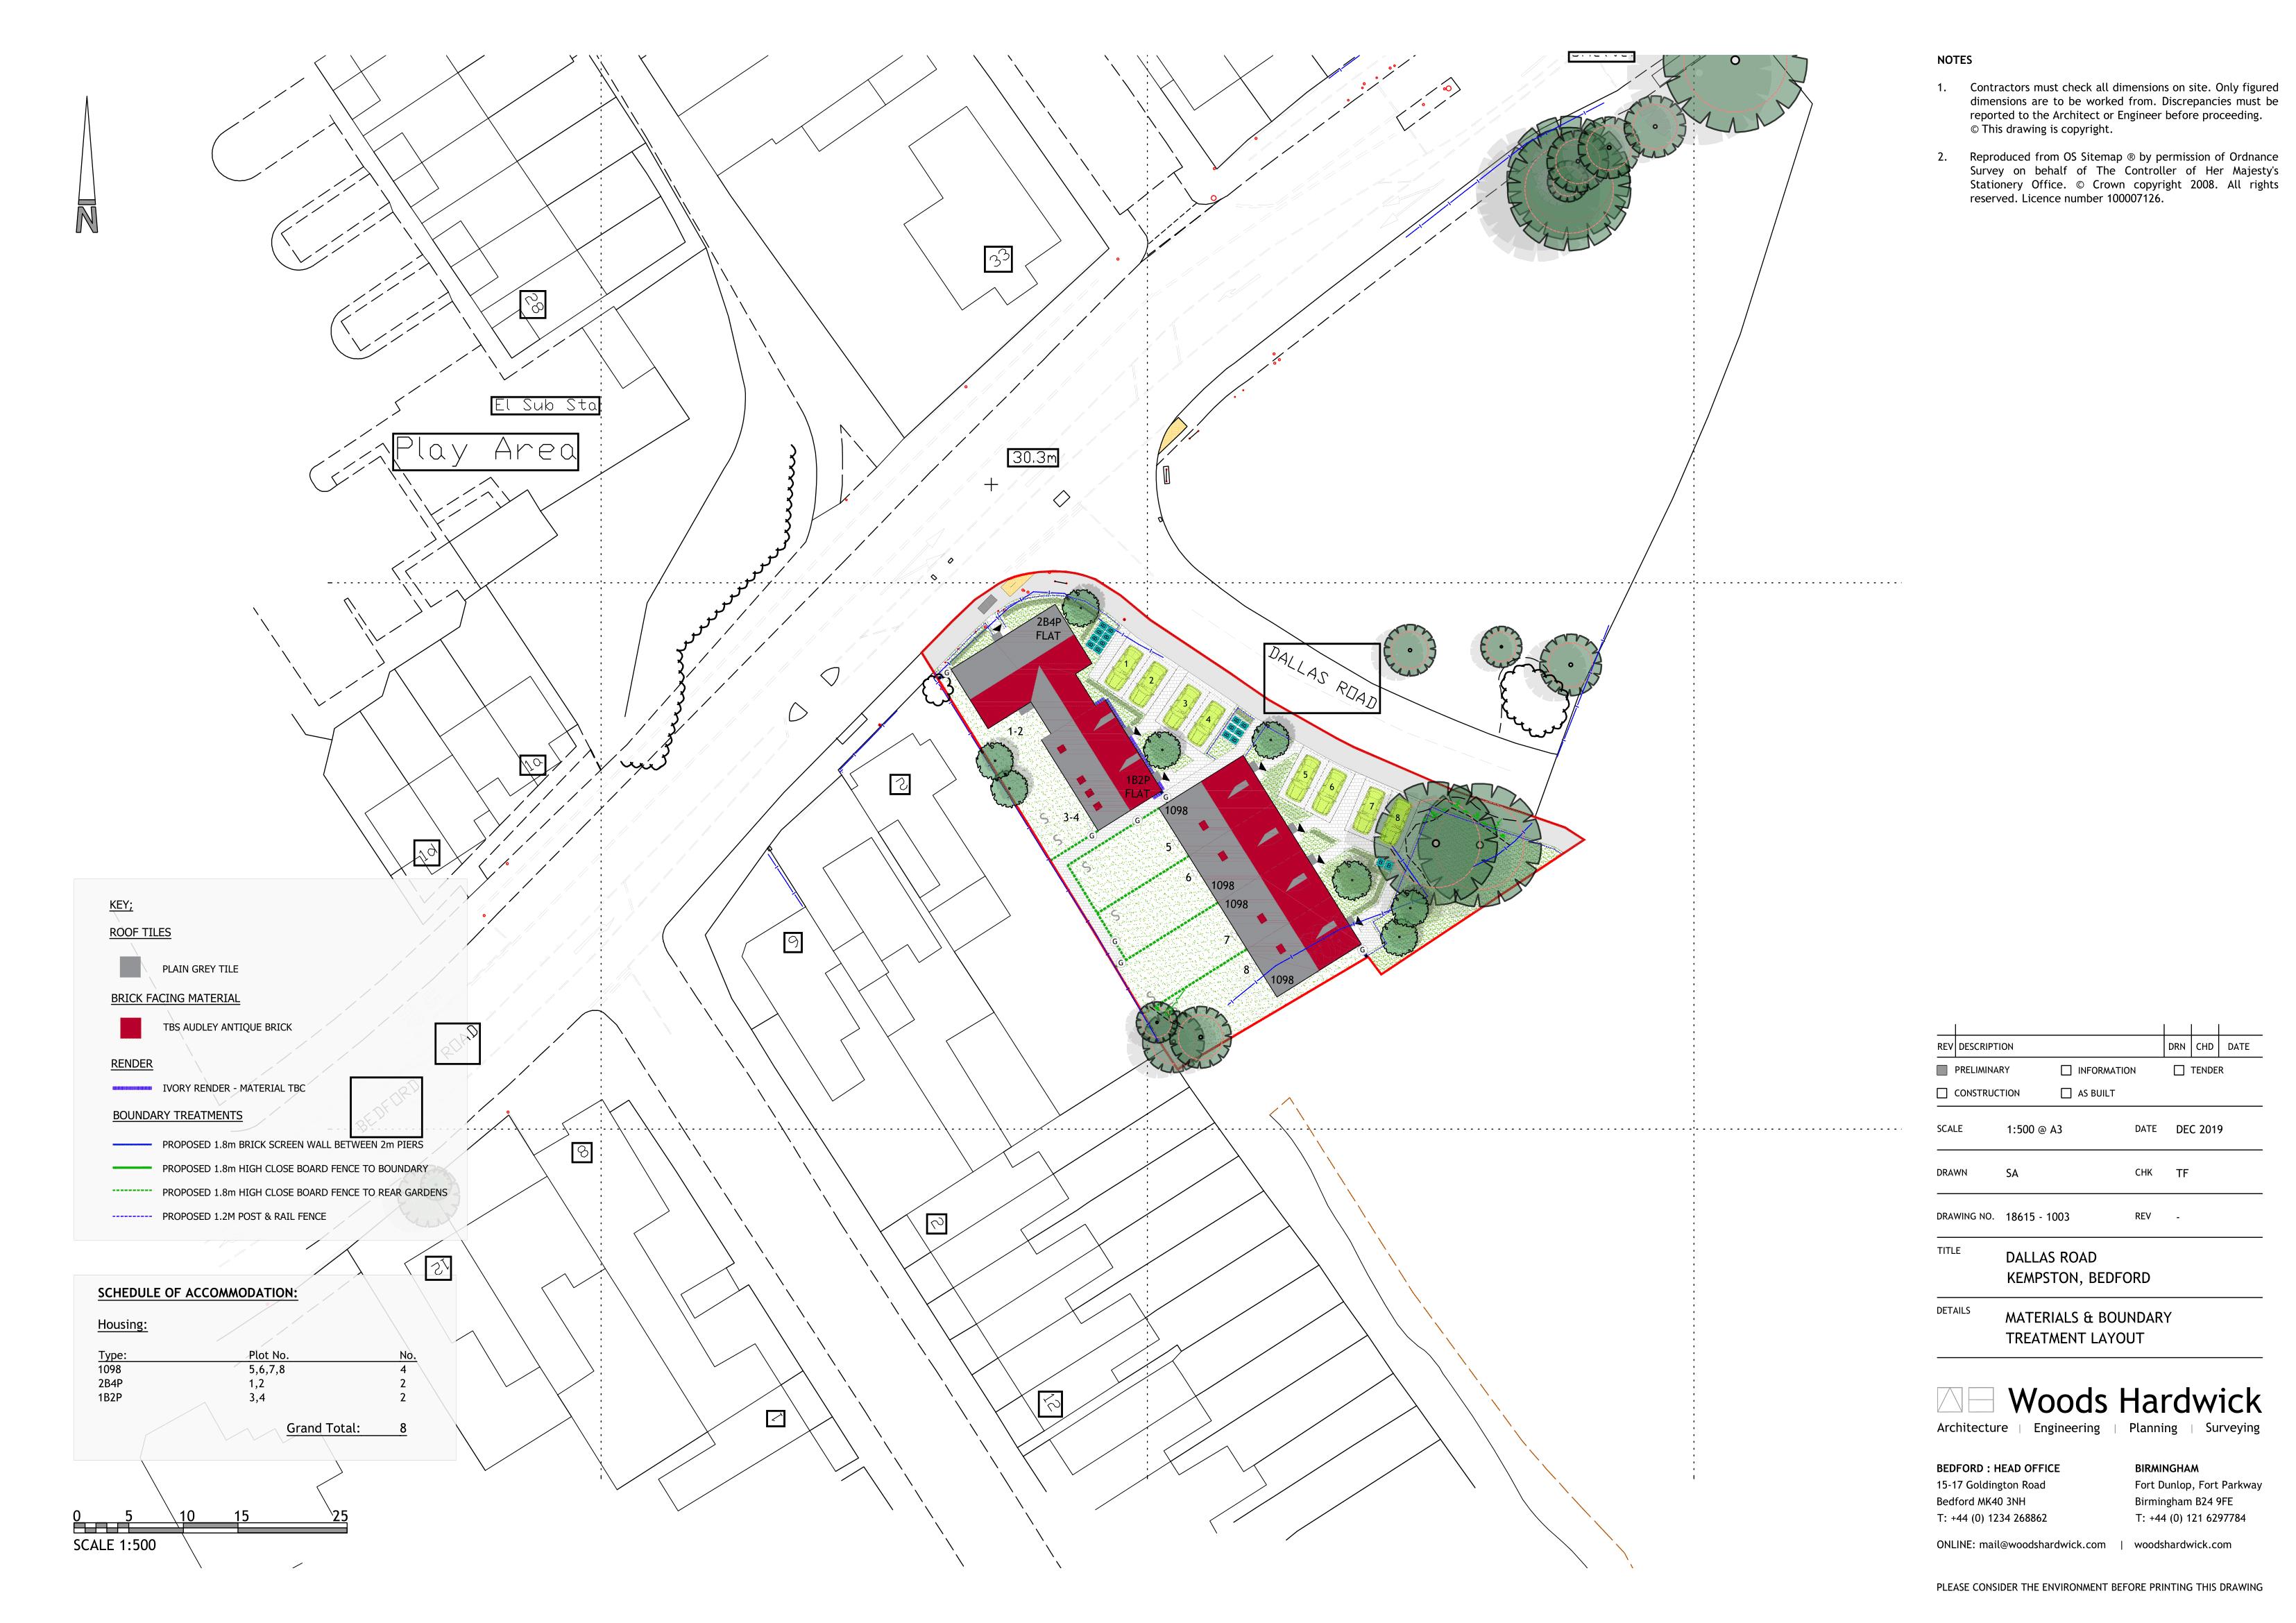 Materials Plan - 1003-1